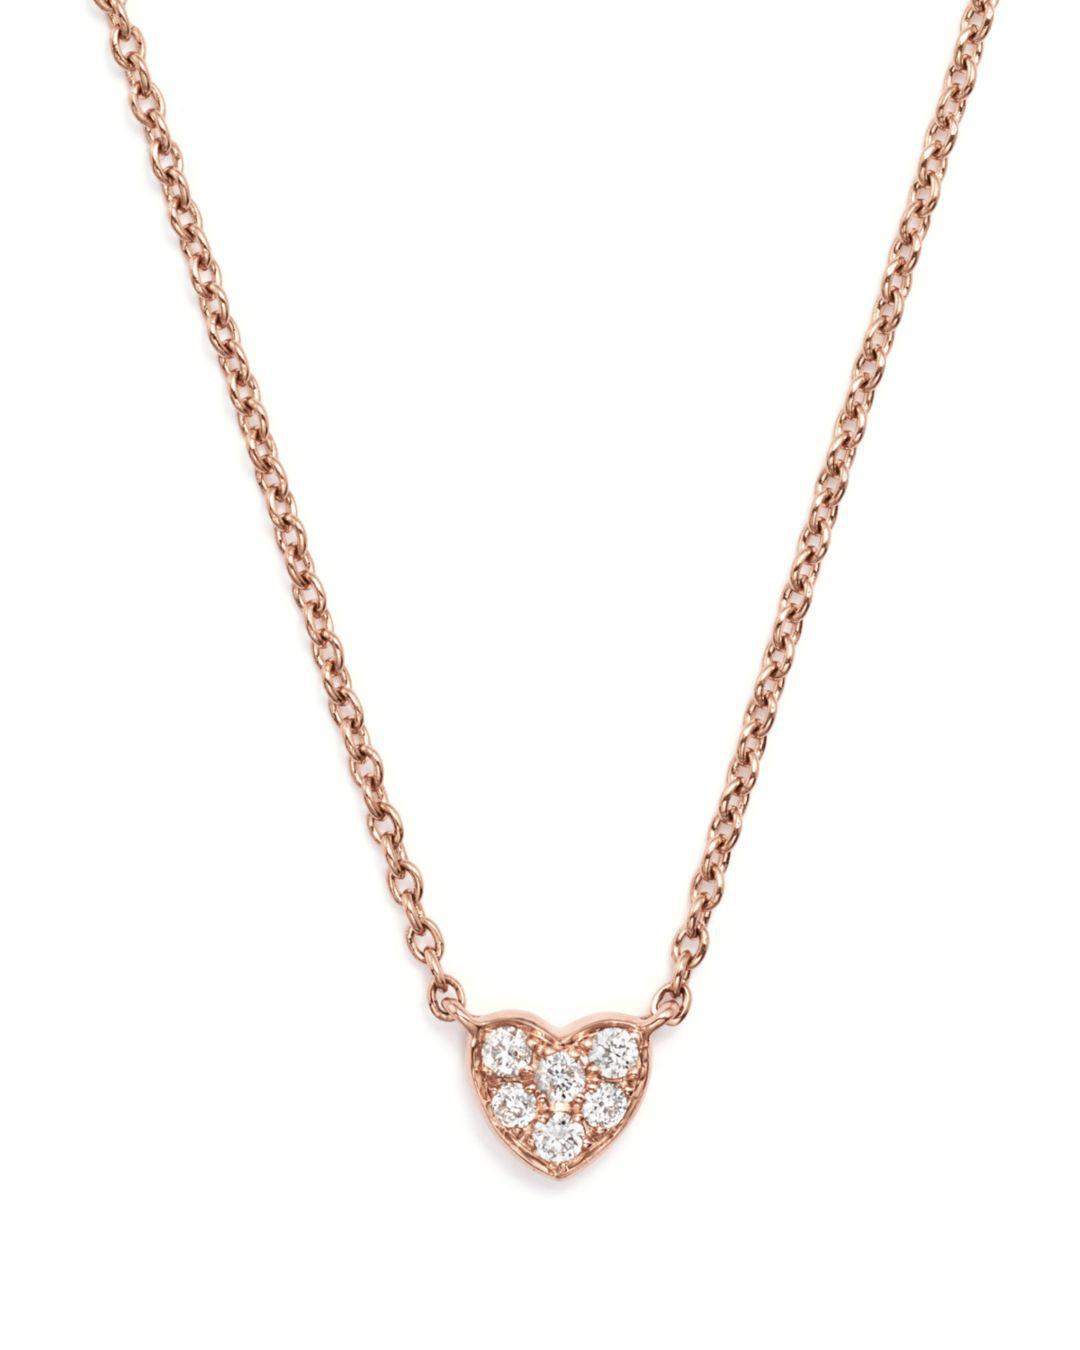 89ebf91eff8d Bloomingdale's - Multicolor Mini Diamond Heart Pendant Necklace In 14k Rose  Gold, .07 Ct. View fullscreen